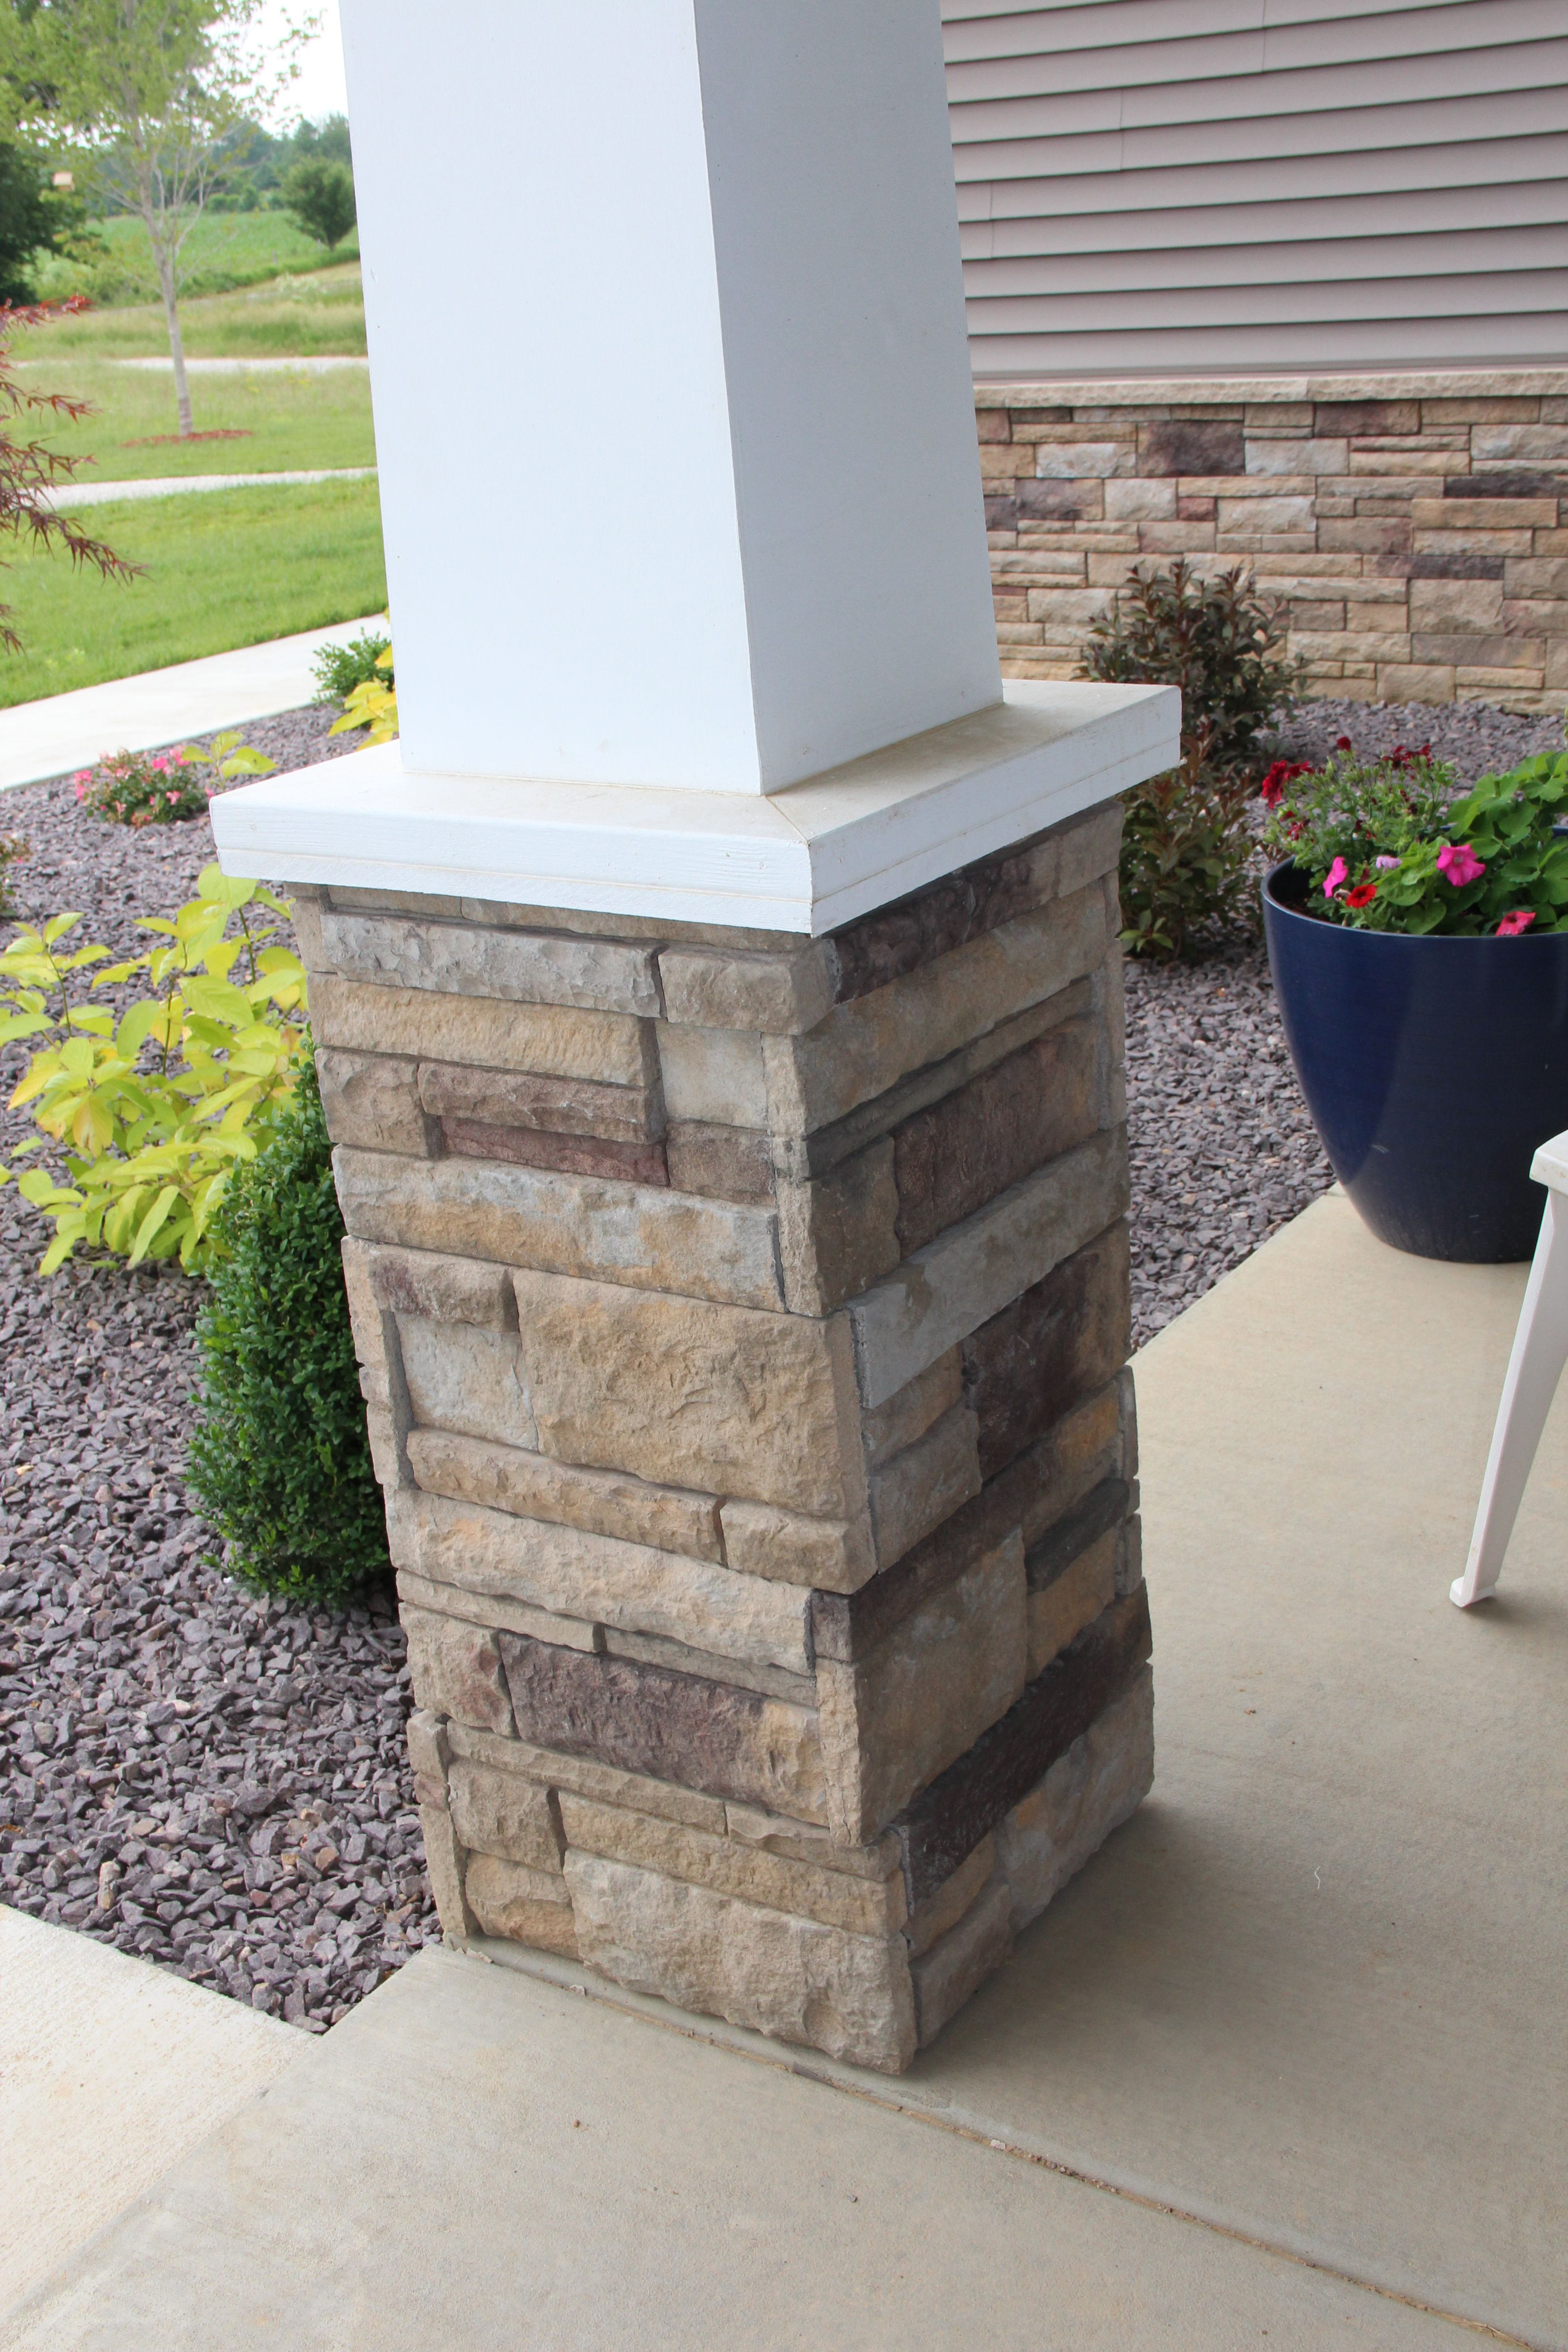 Versetta Stone on front porch column modern craftsman style home